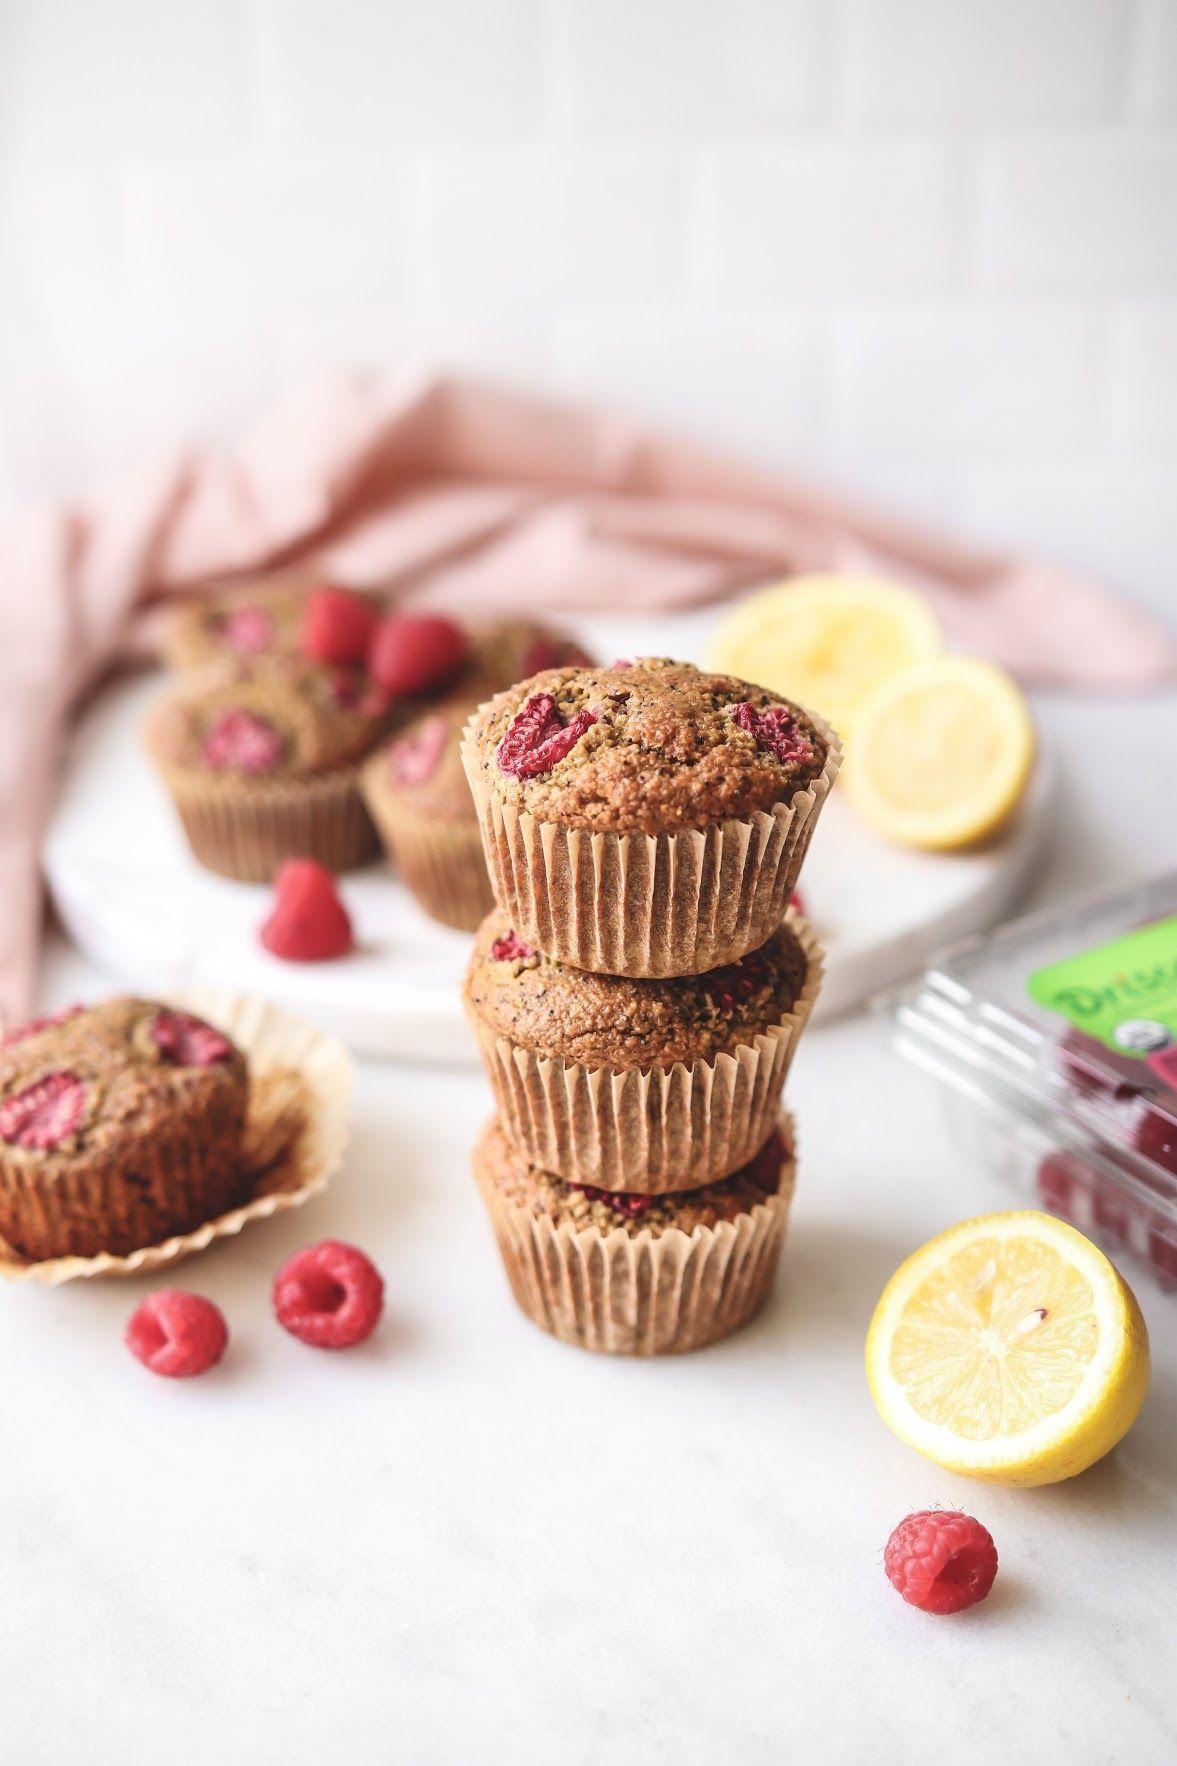 Raspberry Lemon Poppyseed Muffins